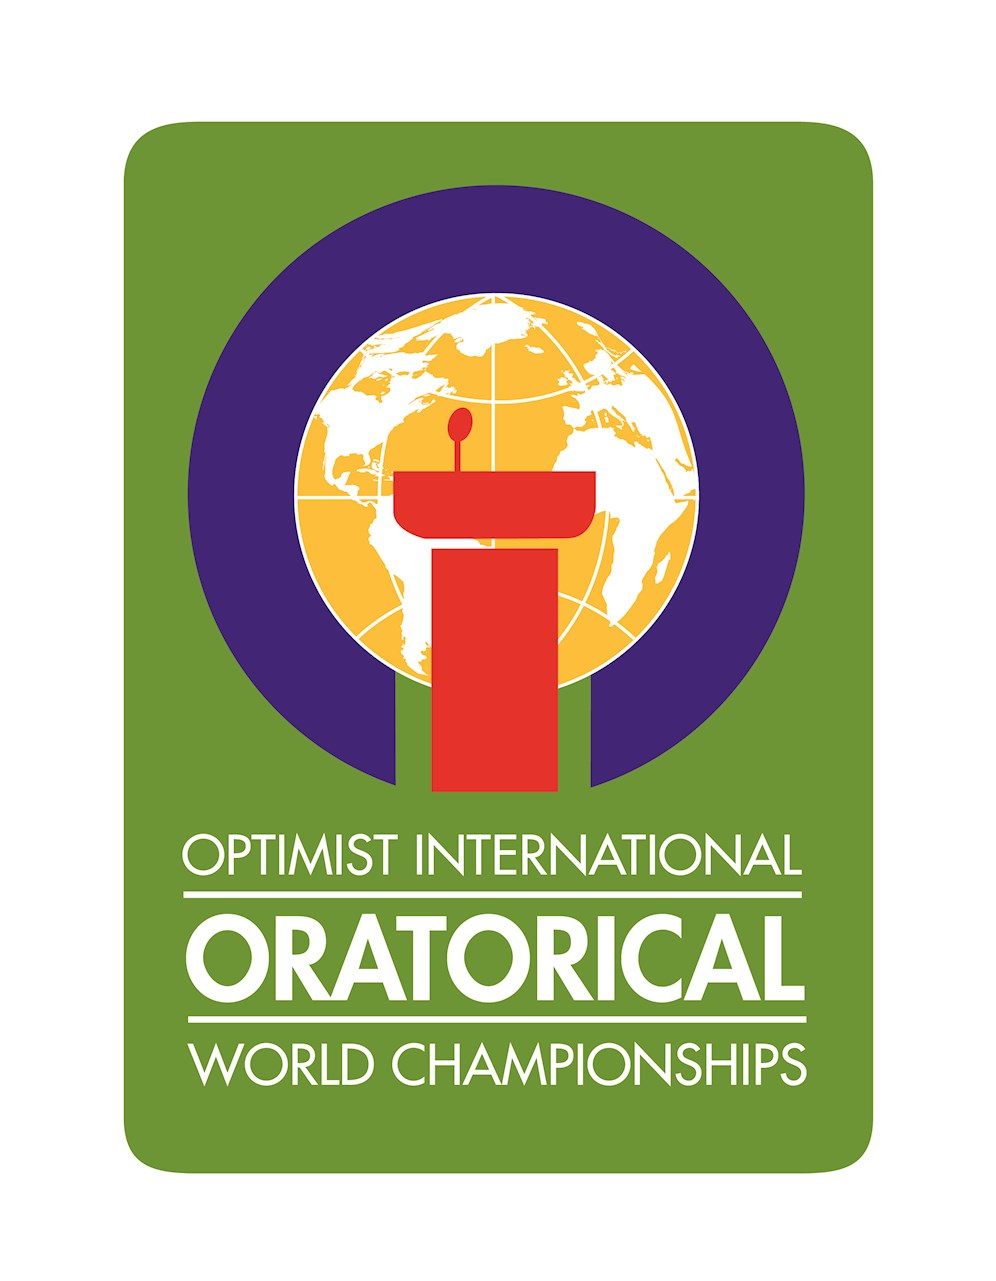 006 Optimist International Essay Contest Example Oratorical High Wondrous Winners Due Date Full